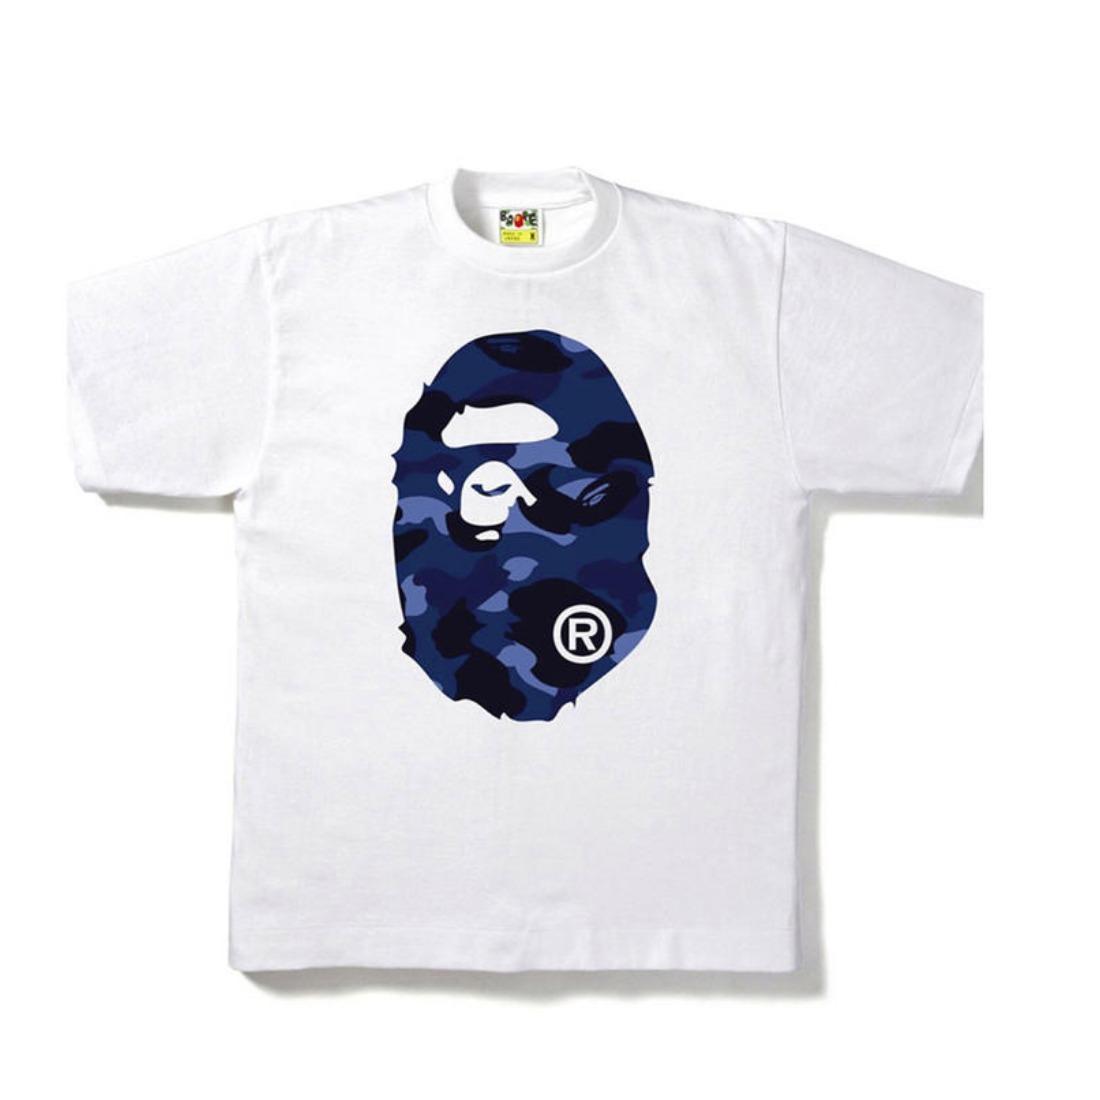 Bape Color Camo Big Ape Head Tee White/Navy